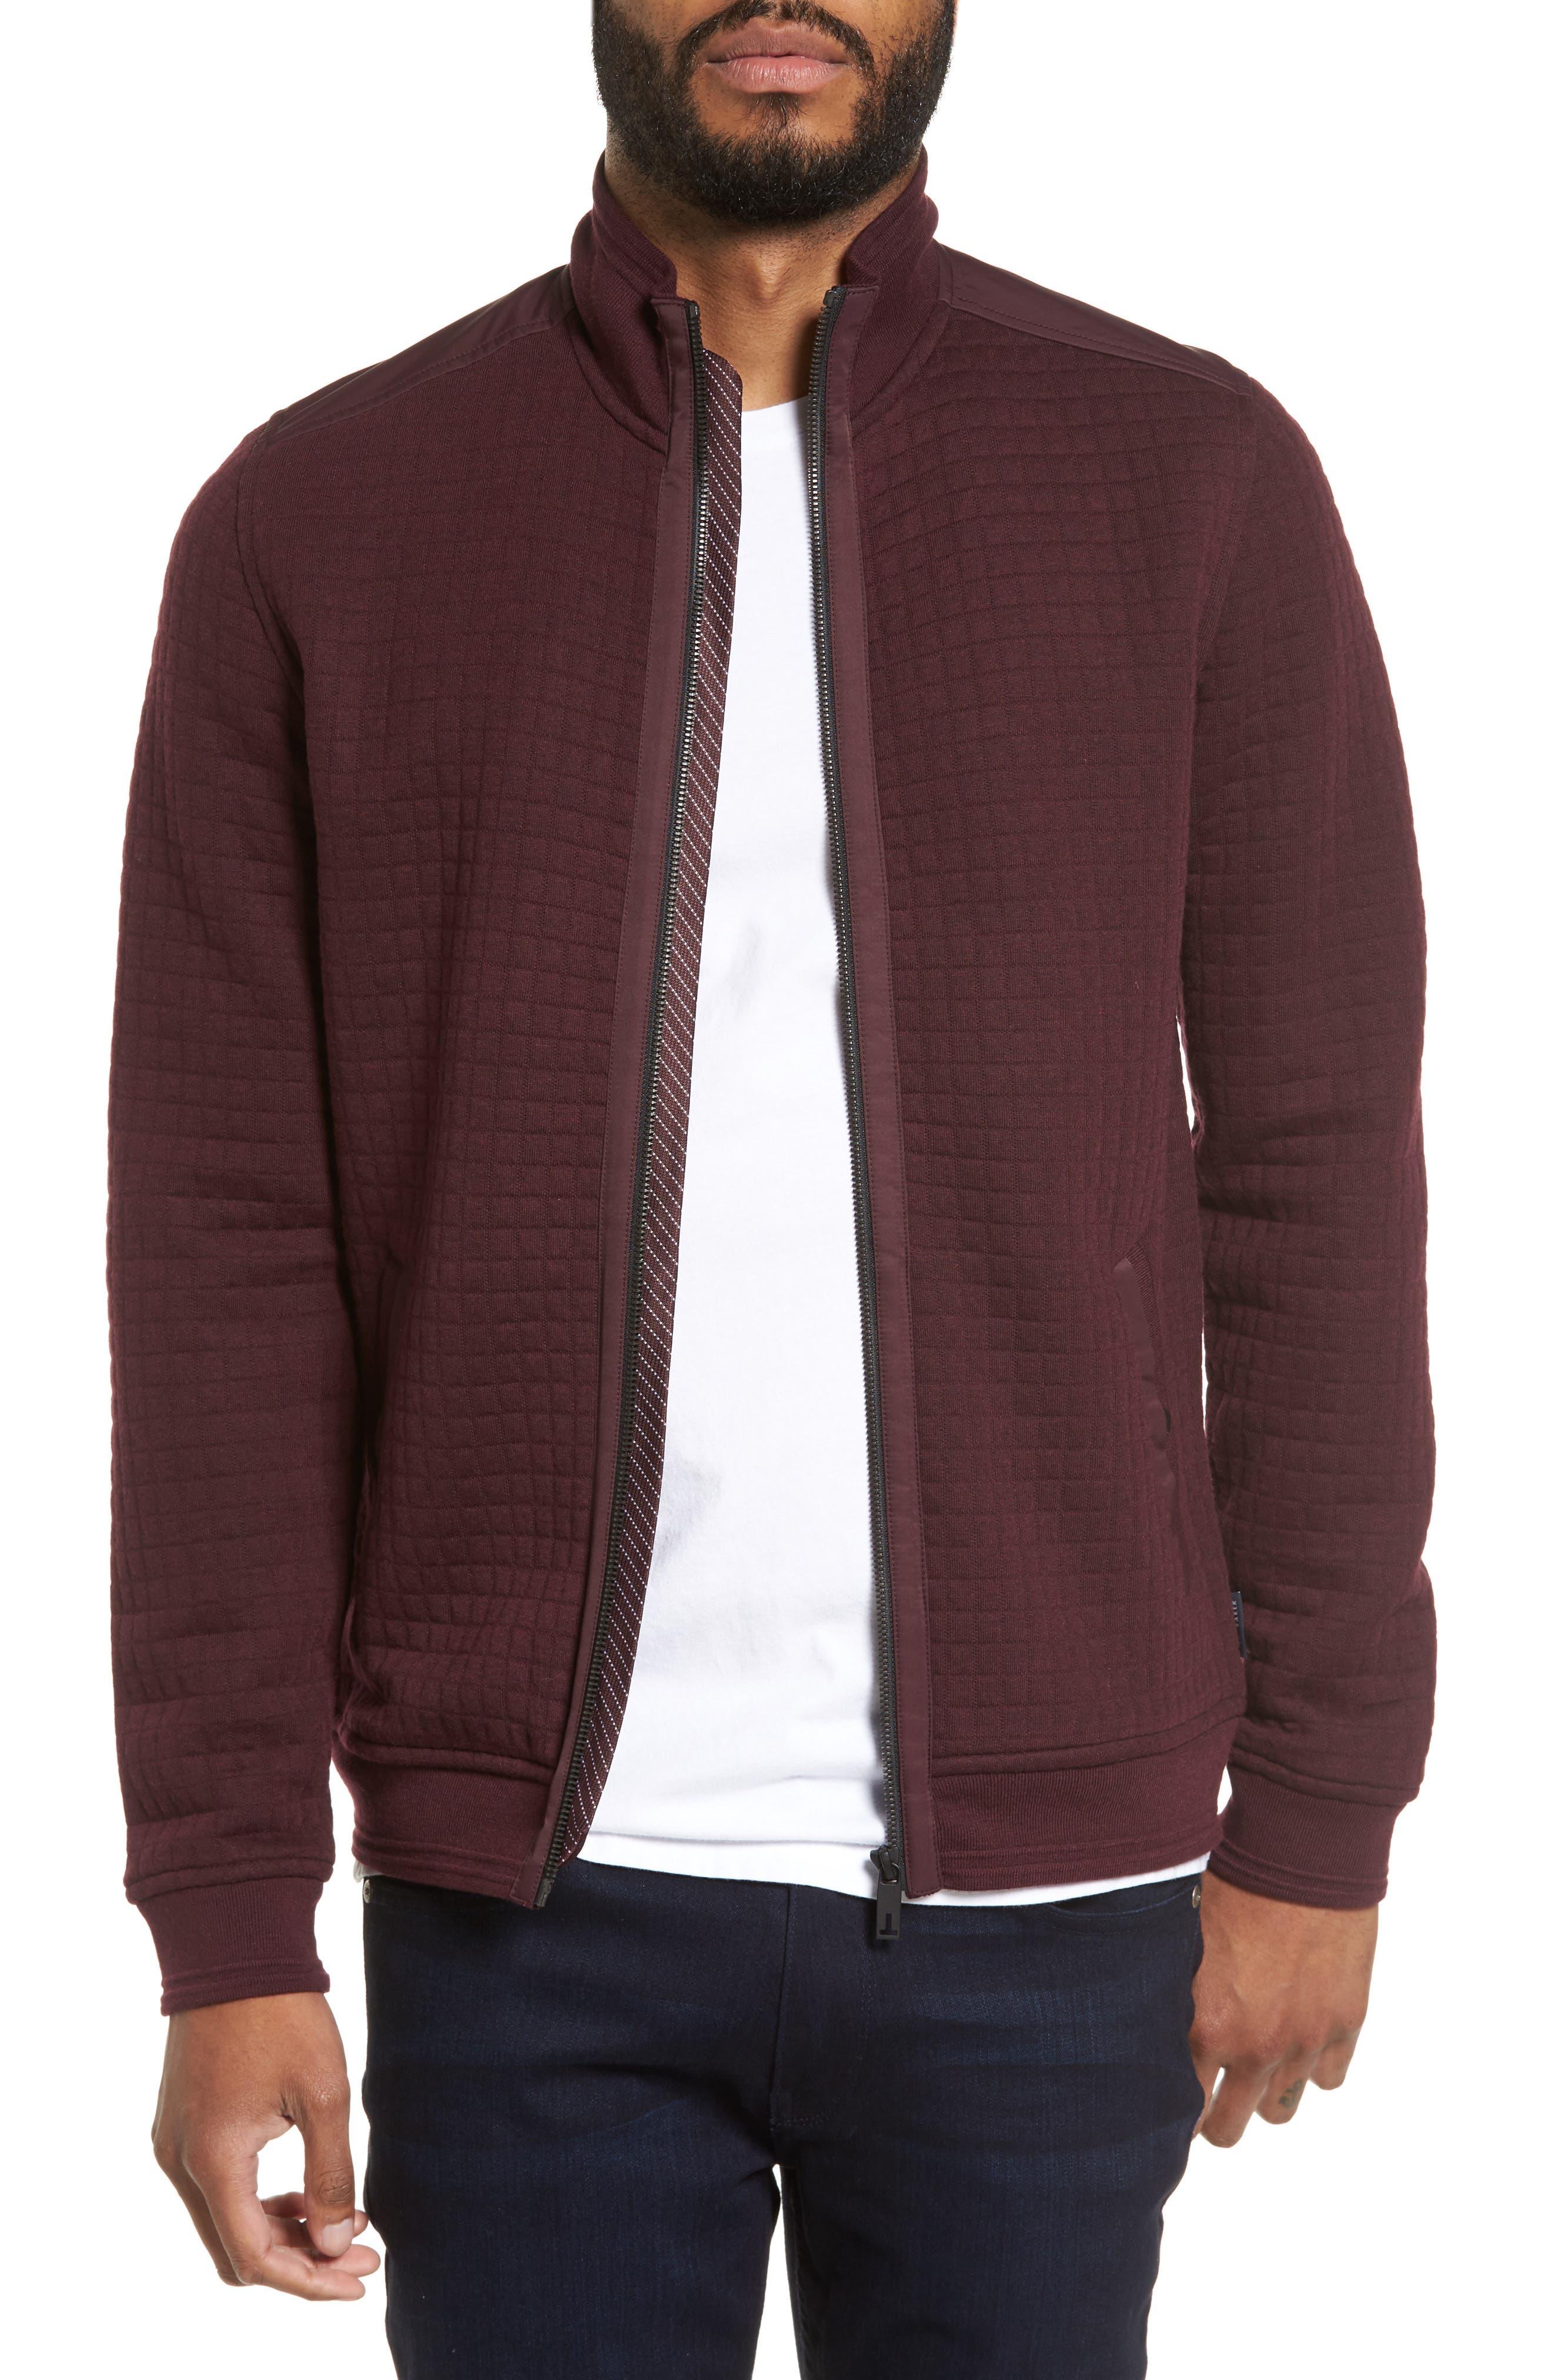 Ken Quilted Bomber Jacket,                         Main,                         color, Dark Red